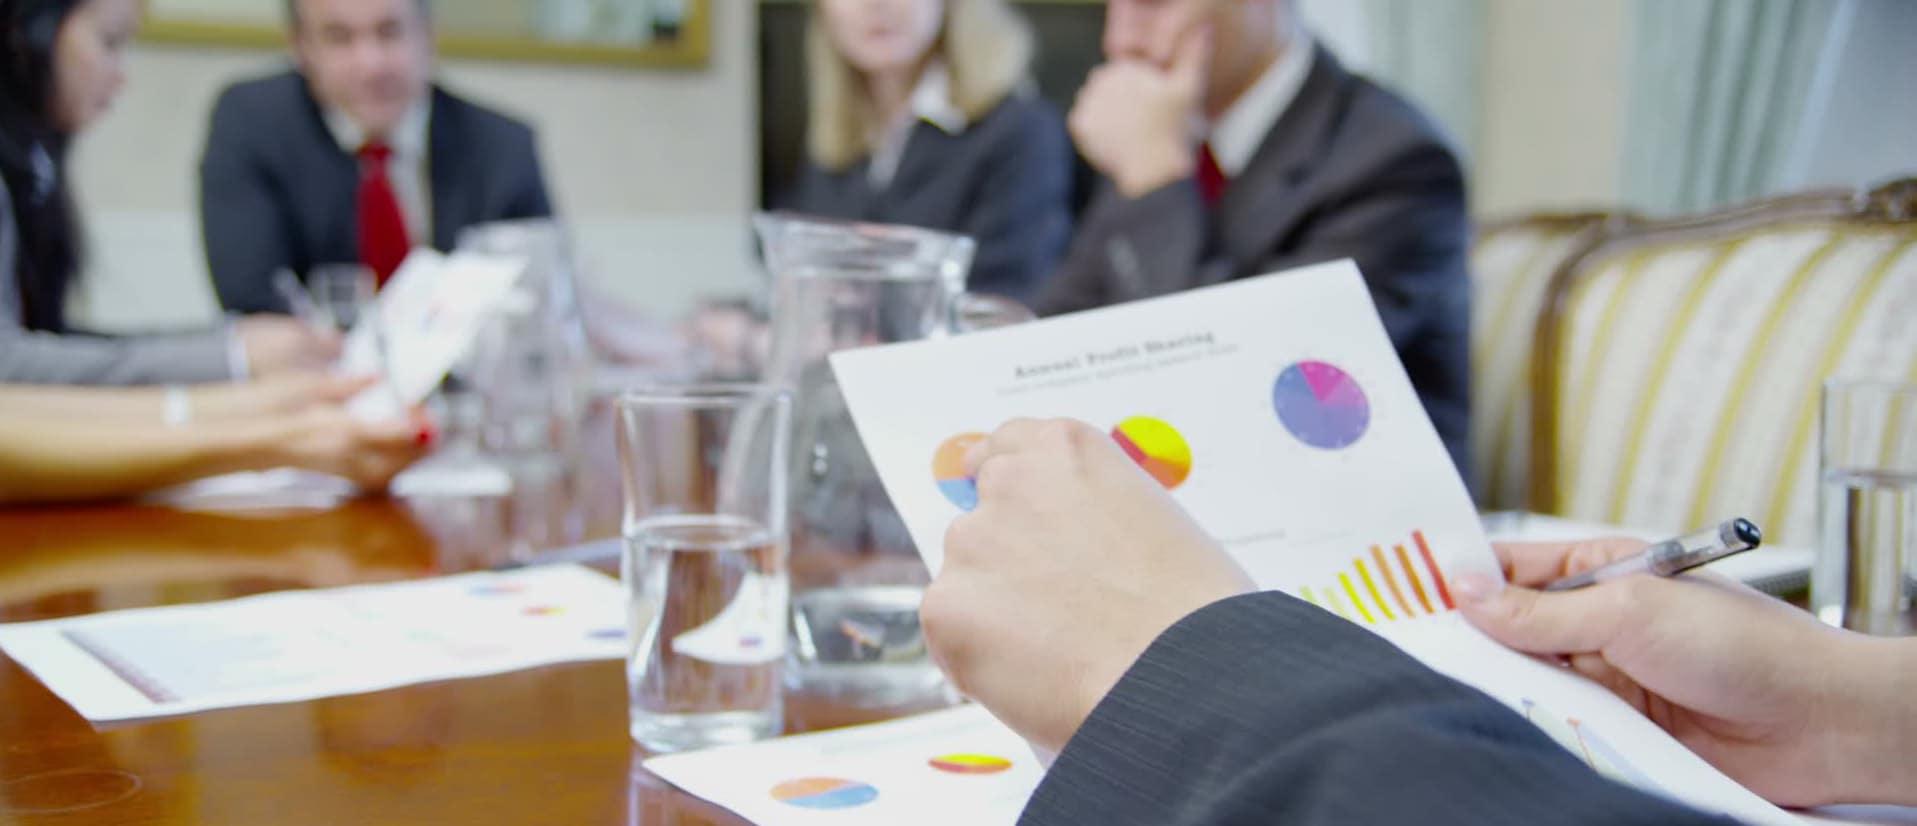 diverse-team-professionals-boardroom-meeting-footage-023505702_prevstill-w1917.jpg